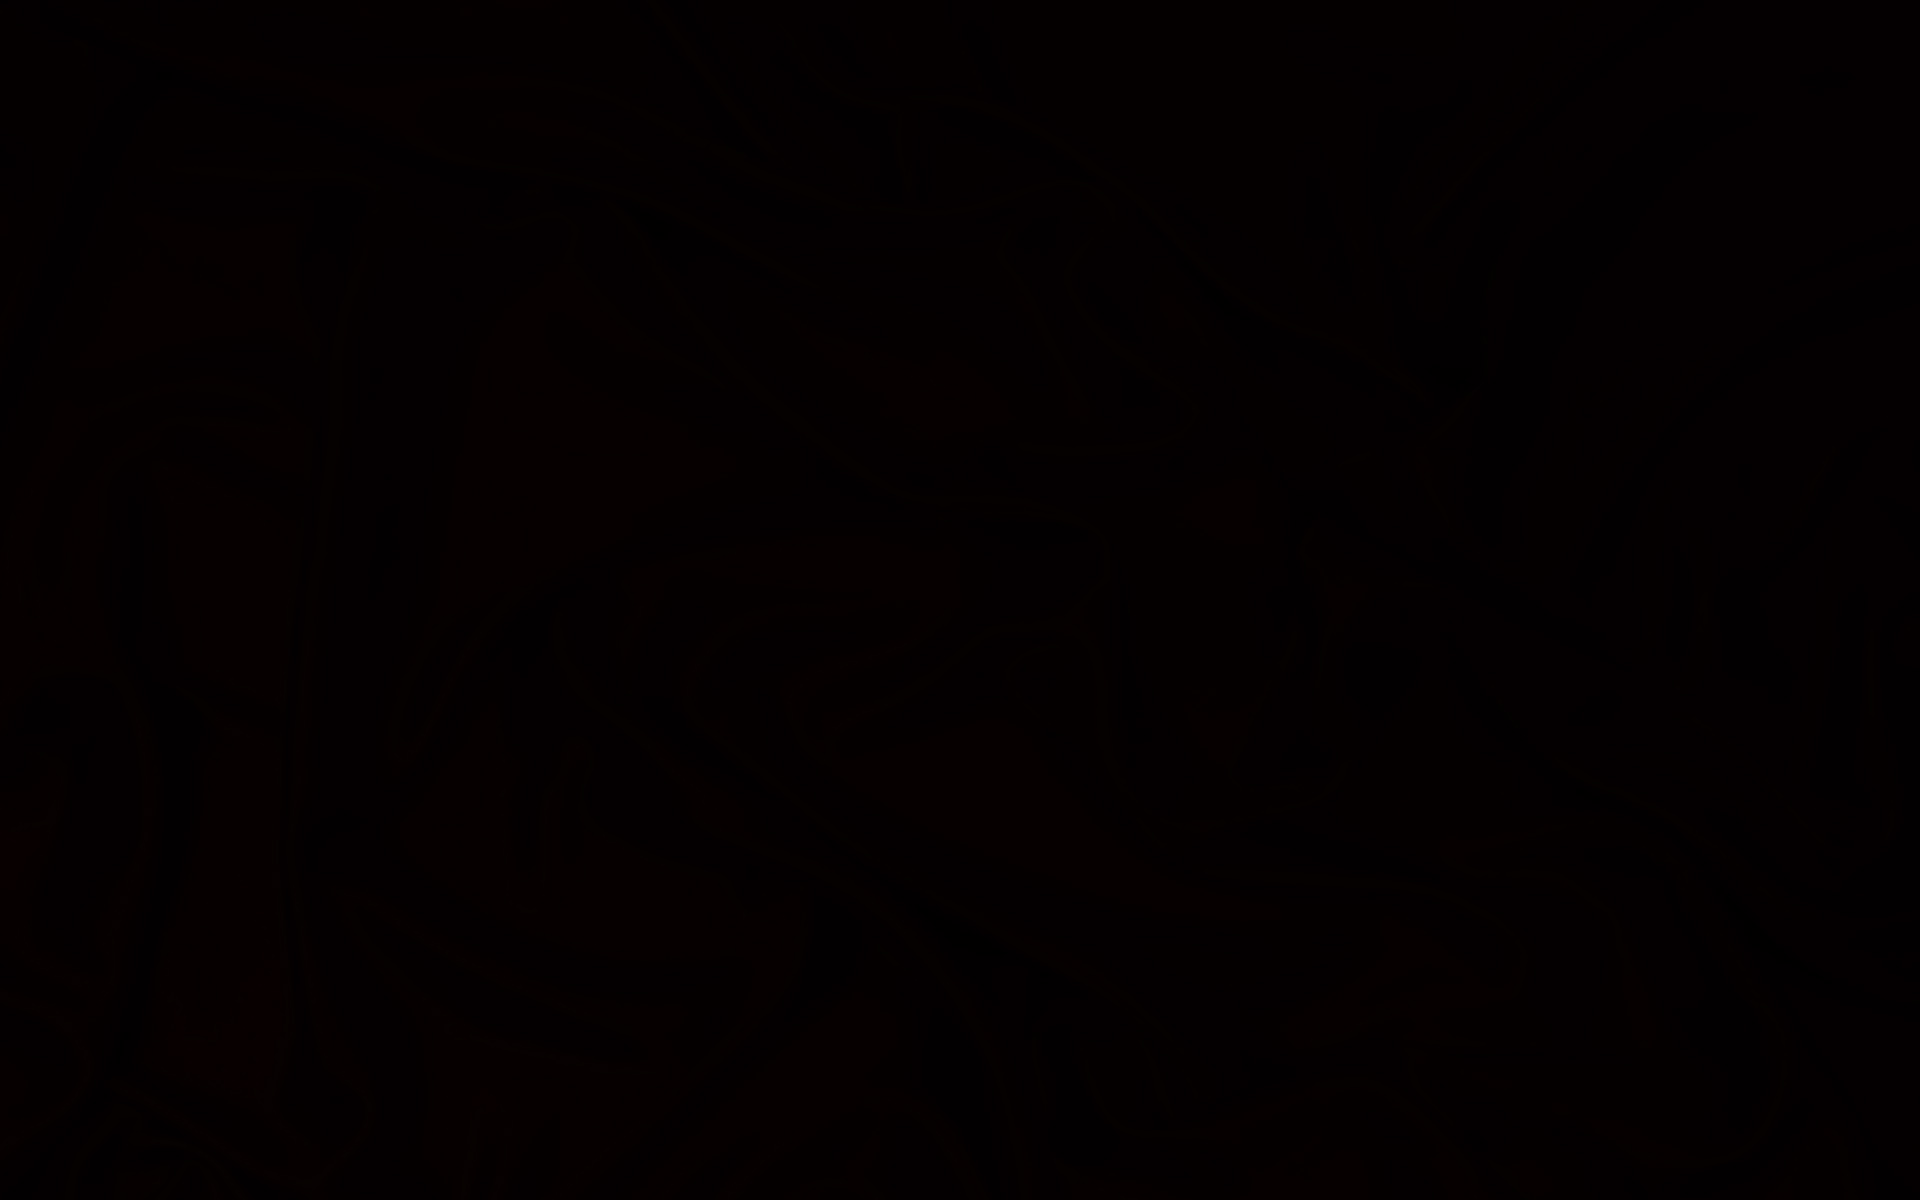 black wallpaper 27635